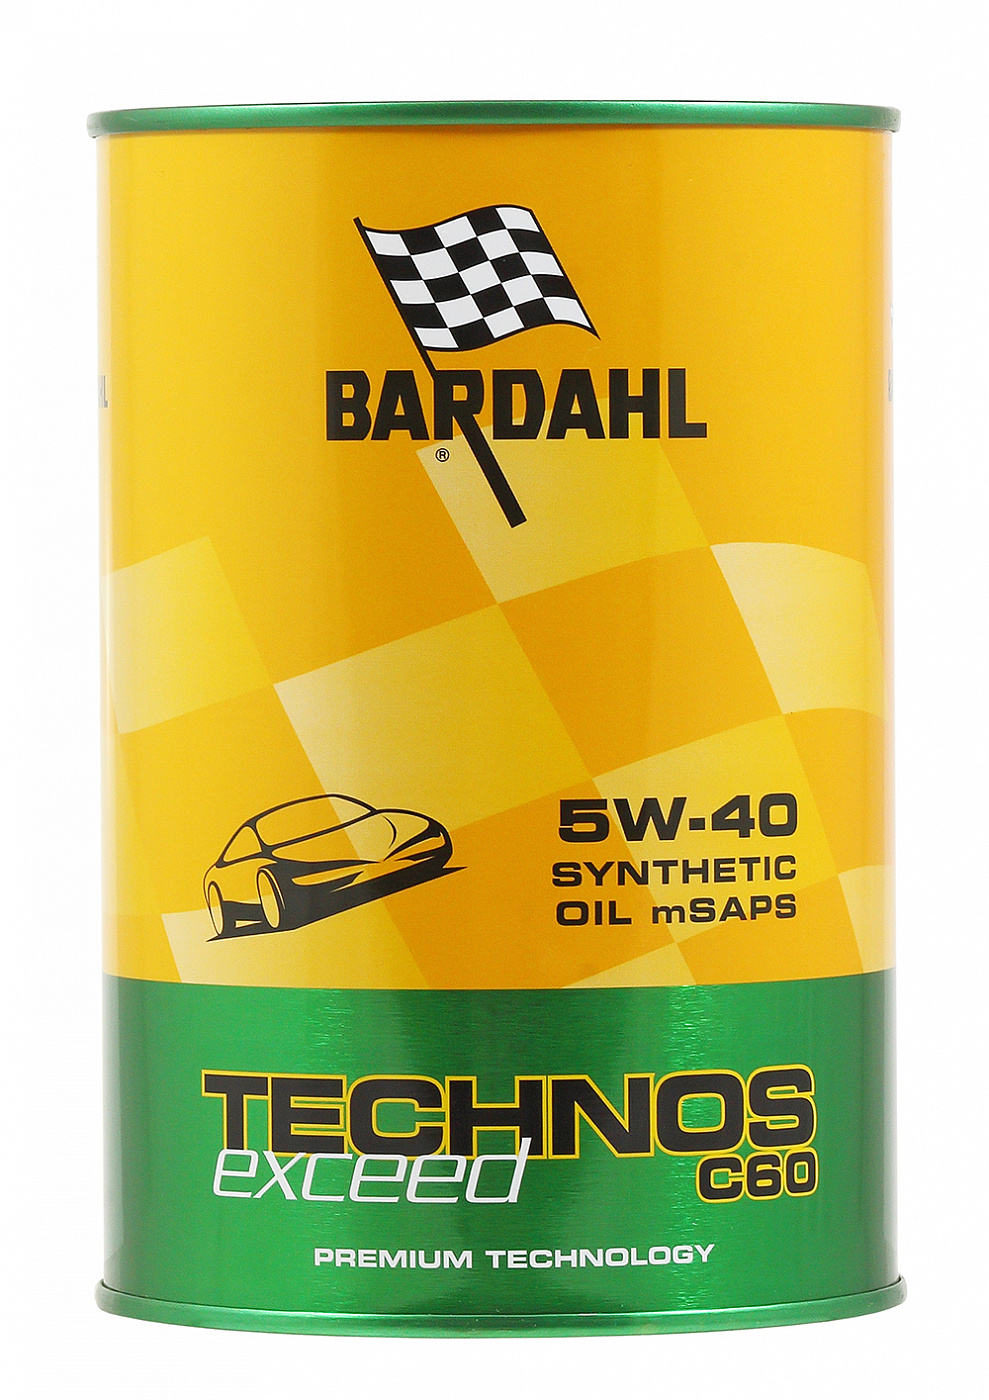 Bardahl TECHNOS MSAPS Exceed C60 5W-40